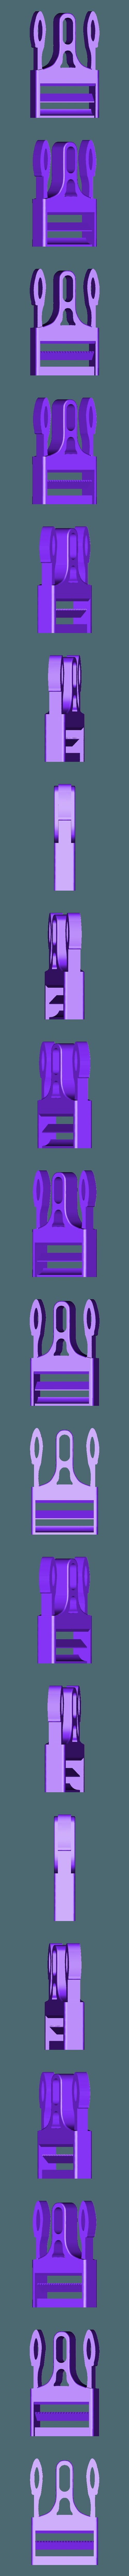 Clip M.stl Download free STL file Plastic clip • 3D printer object, Nitsoh